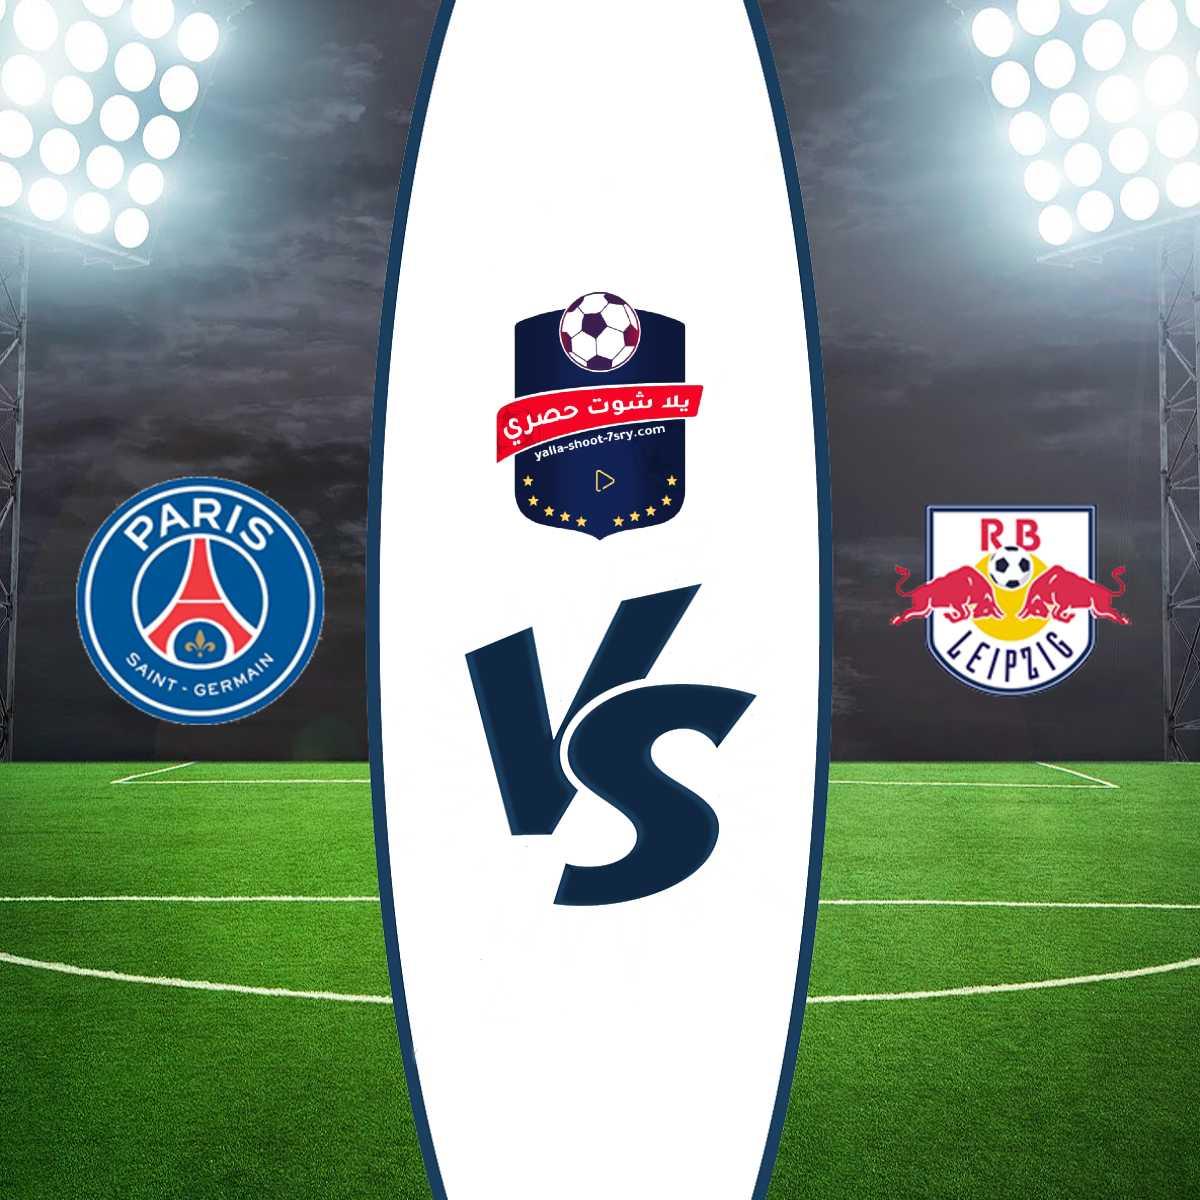 مشاهدة مباراة باريس سان جيرمان ولايبزيج